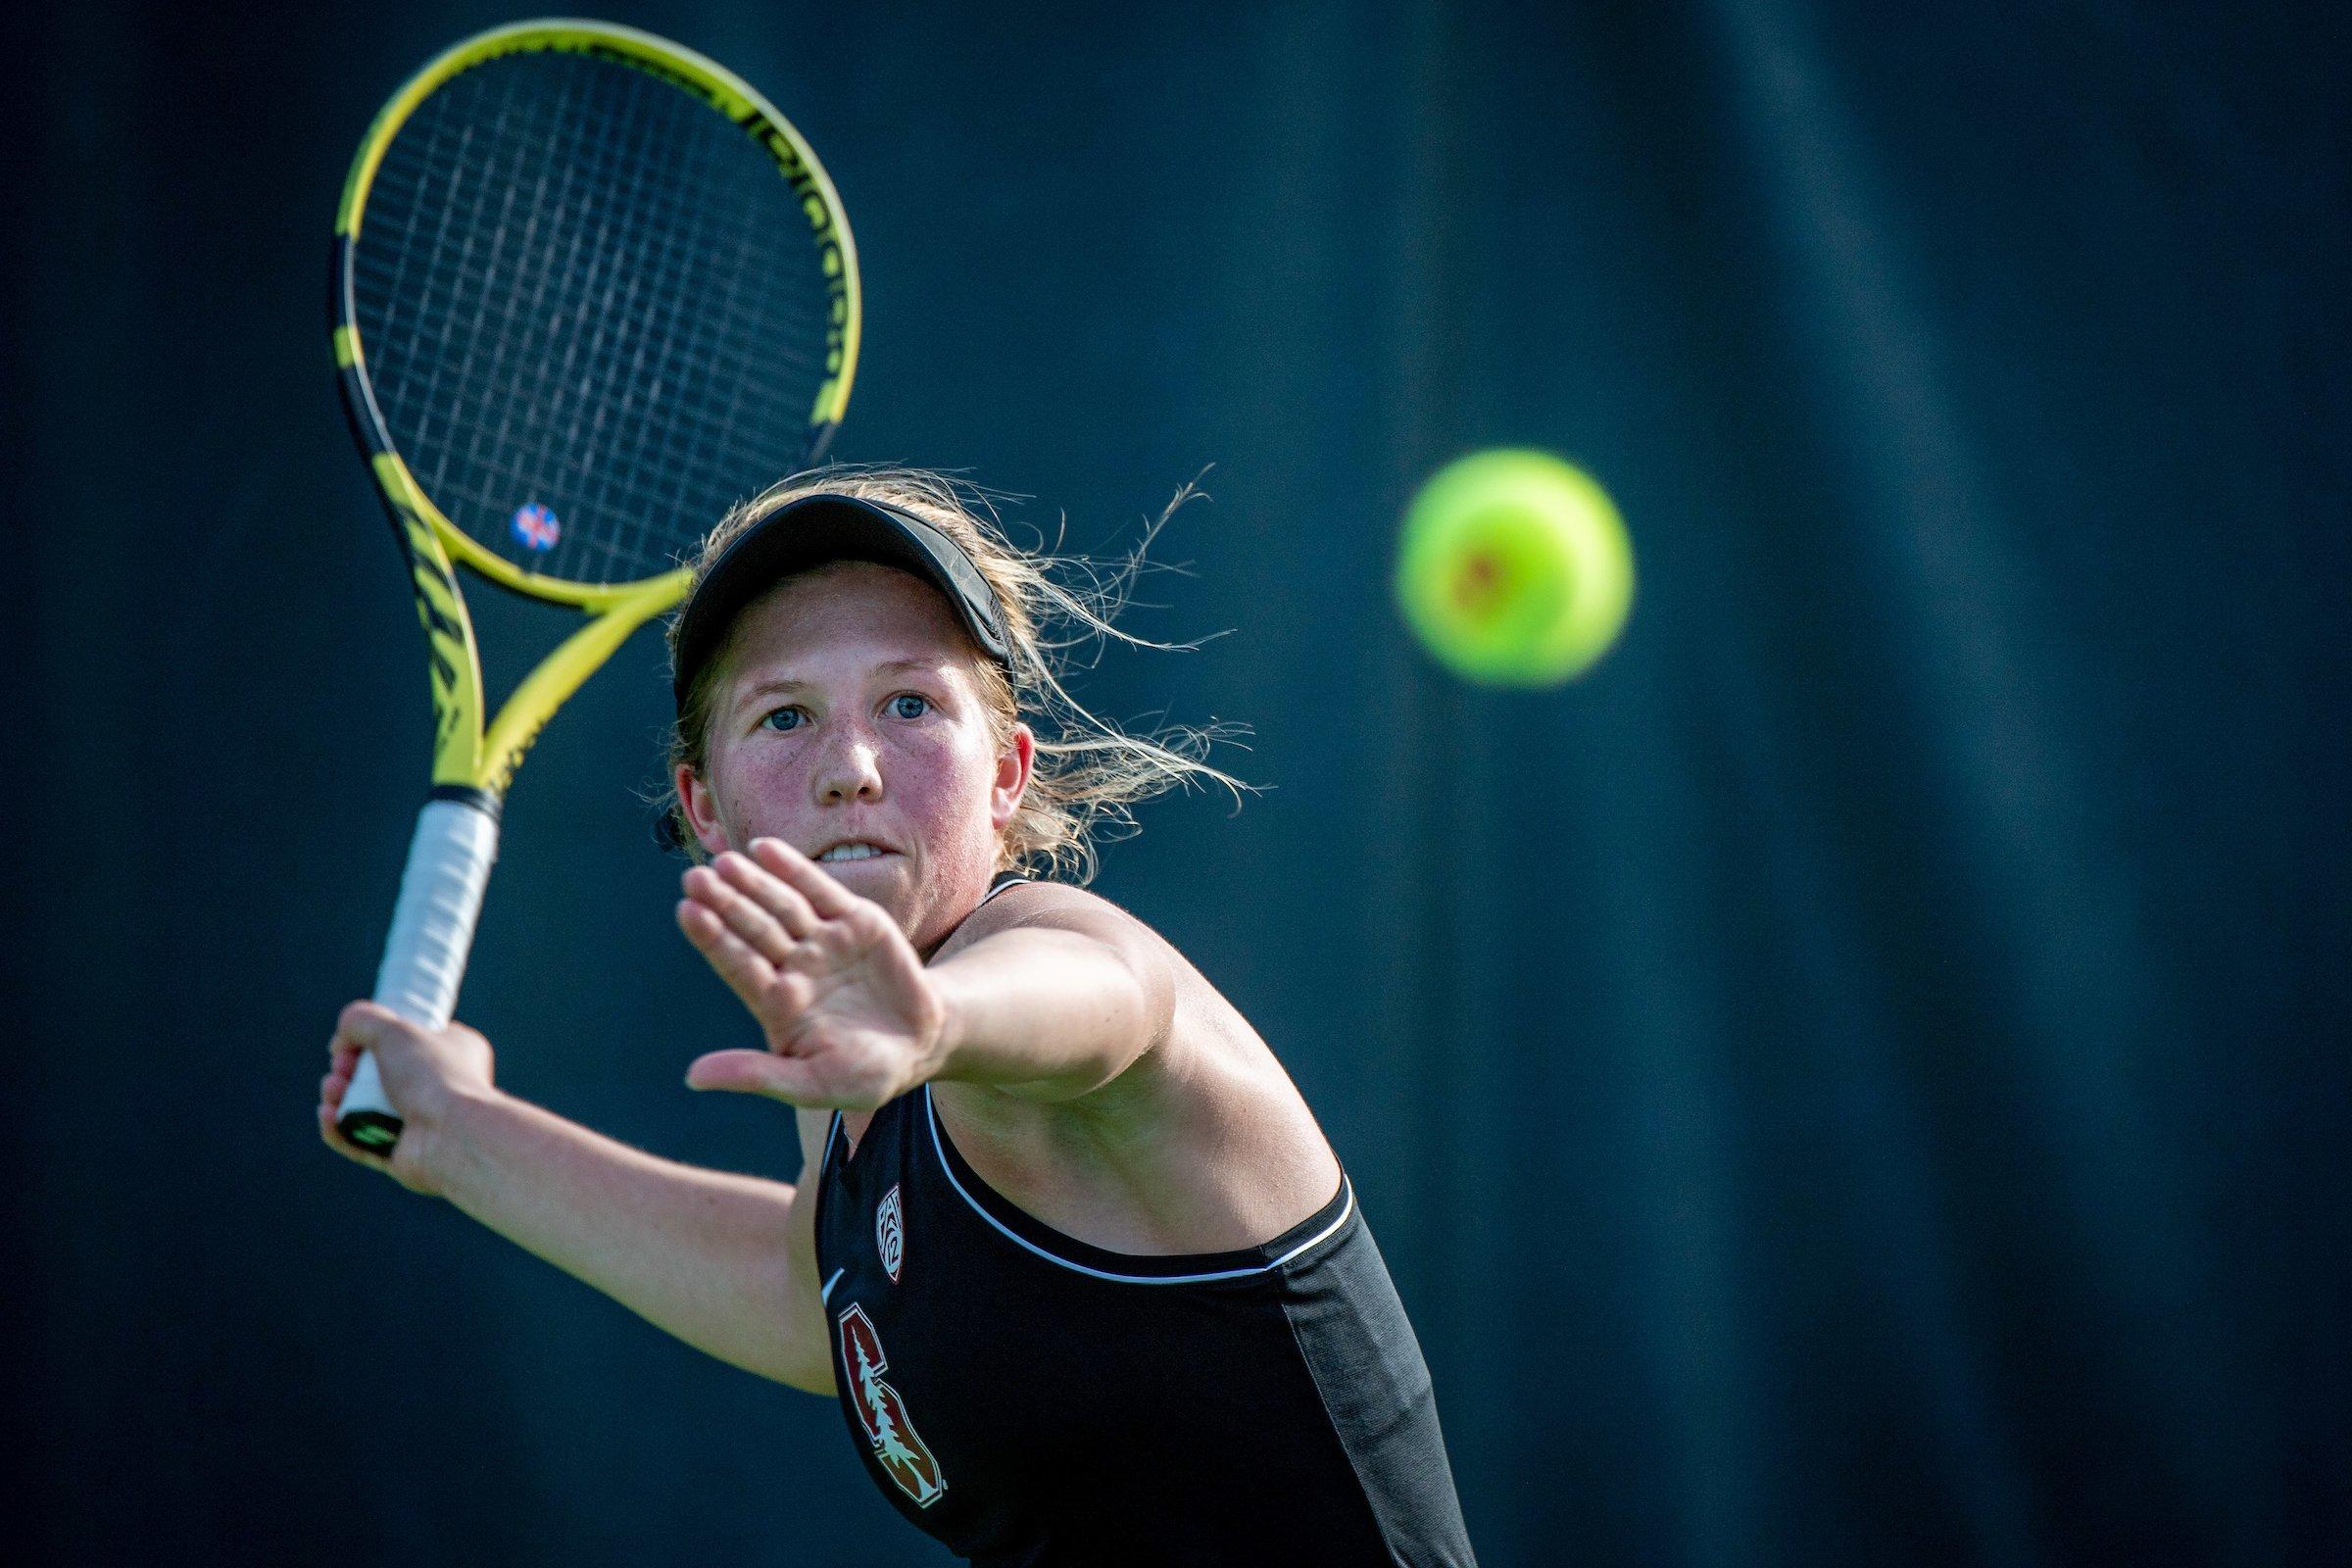 Senior Emily Arbuthnott prepares to swing at an incoming tennis ball.